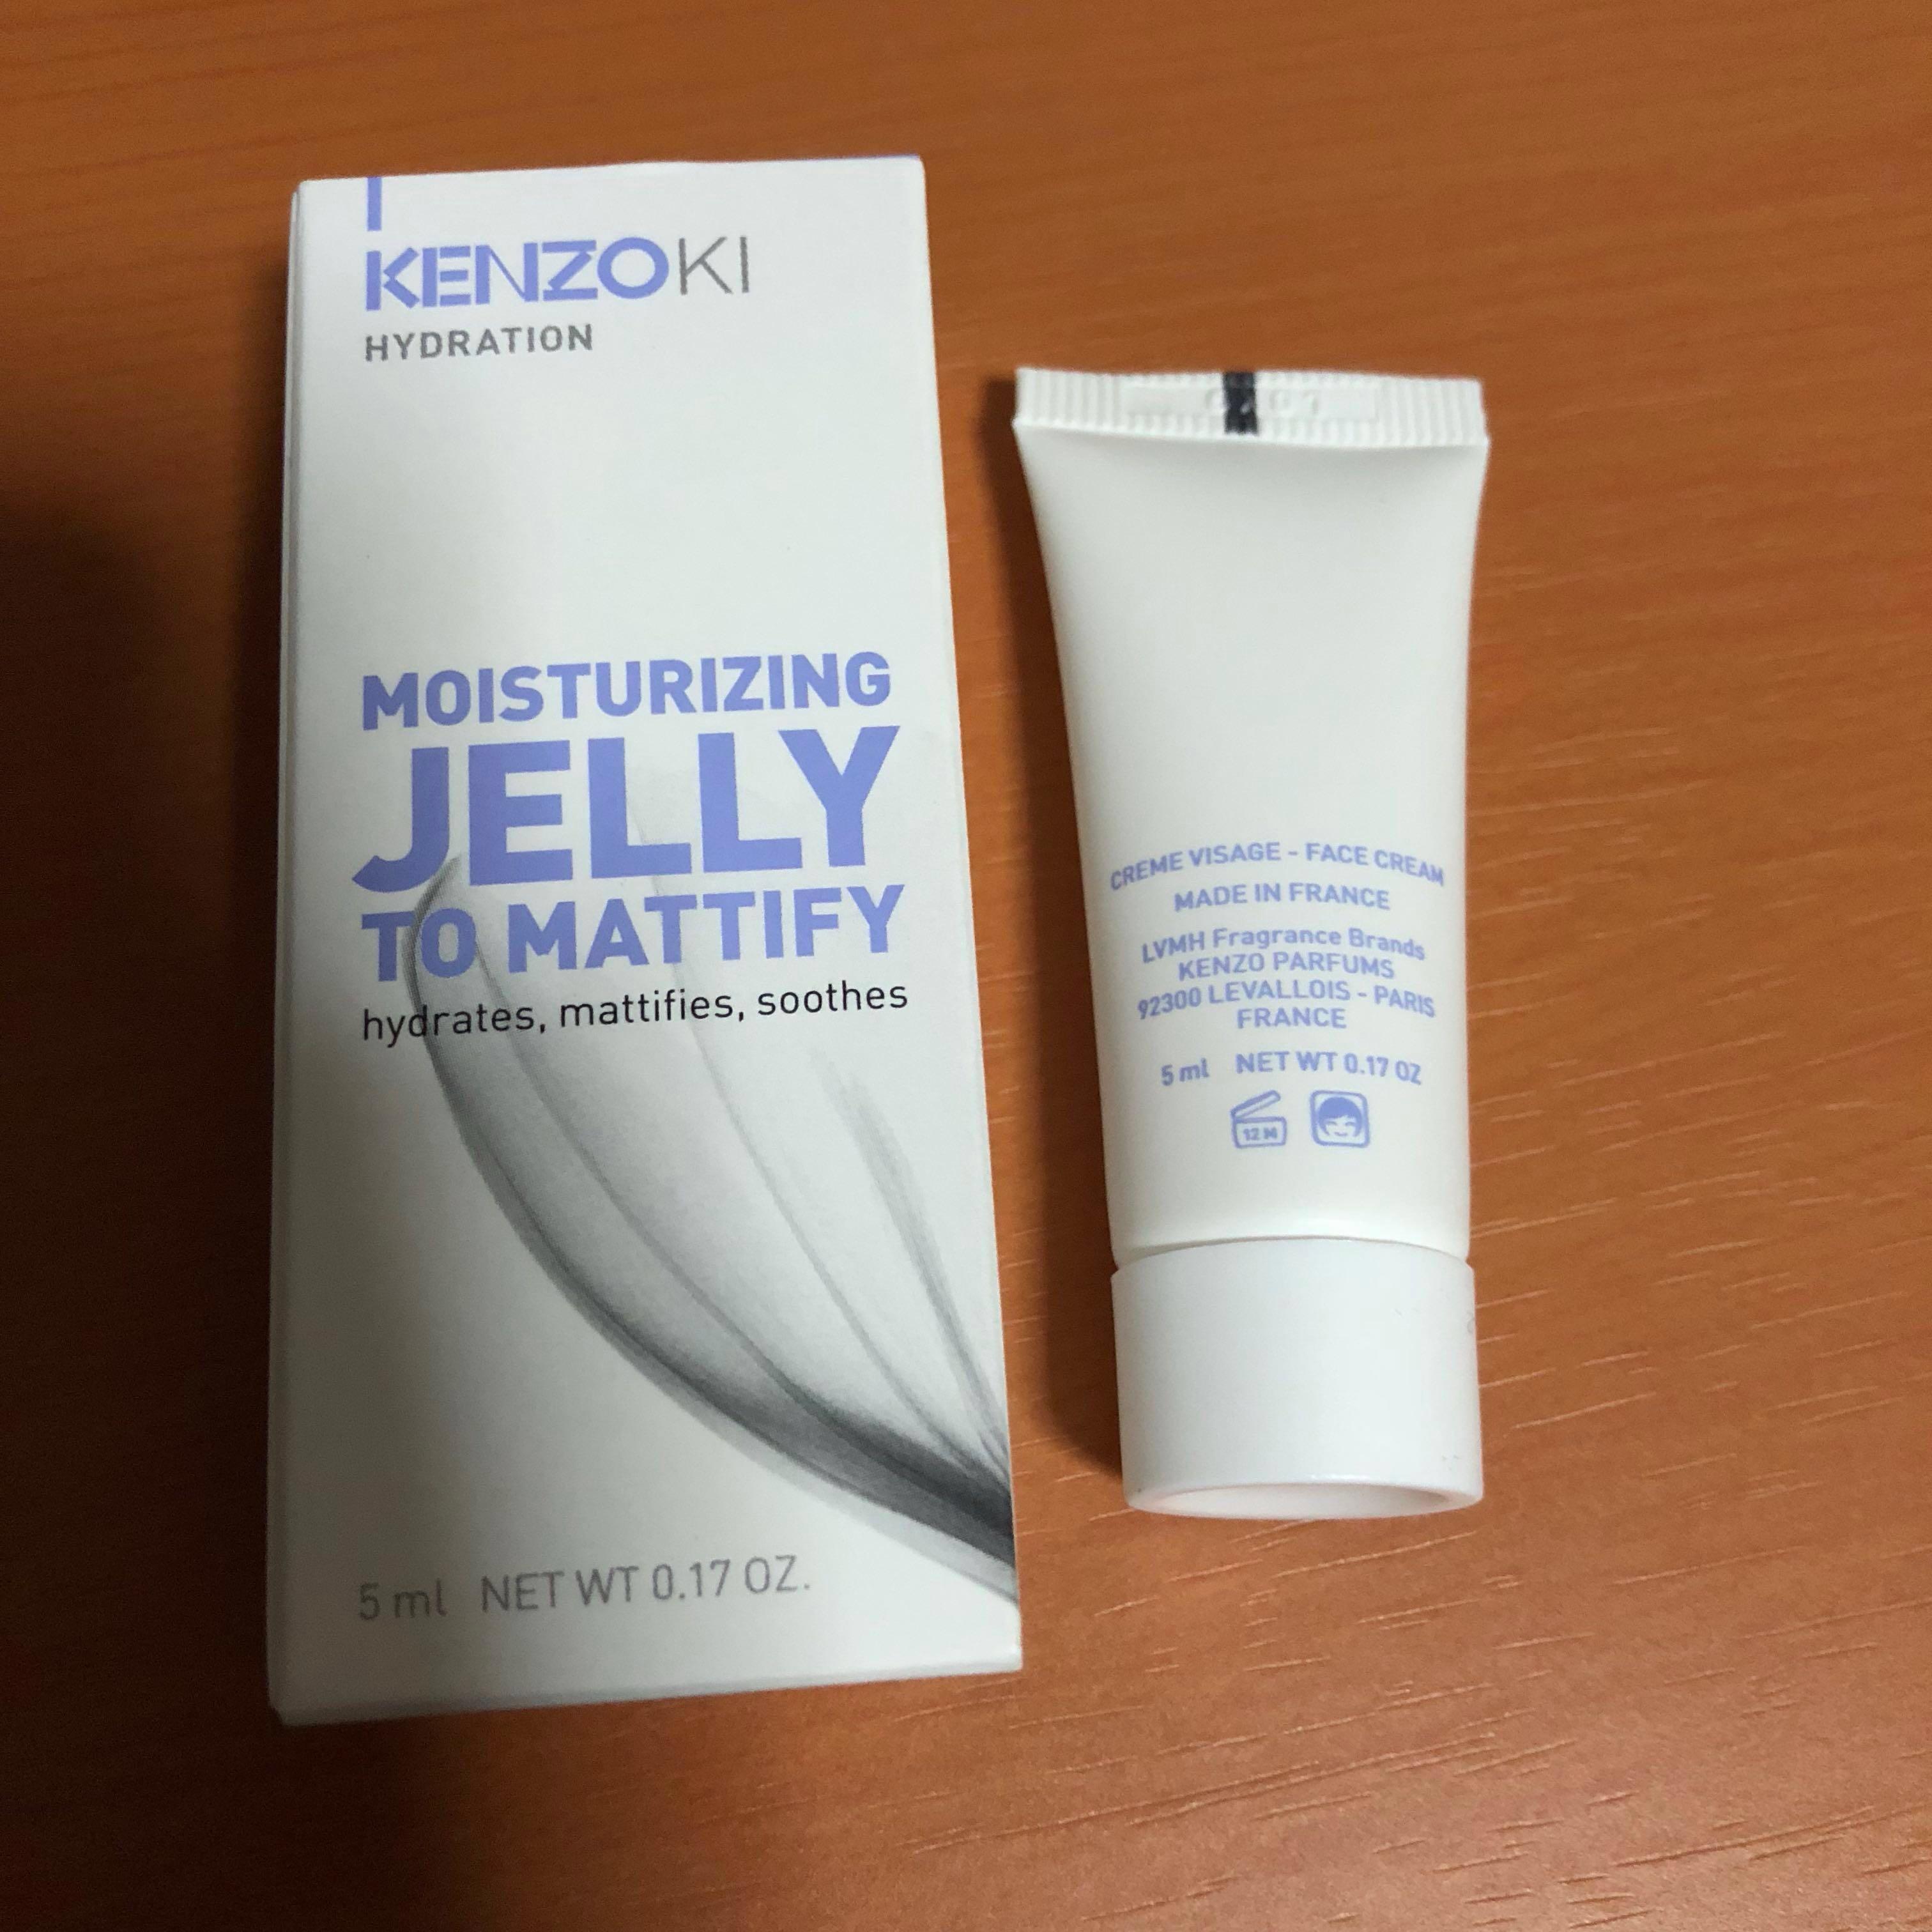 20dc59ac05 Kenzoki Moisturizing Jelly to Mattify, Health & Beauty, Face & Skin Care on  Carousell